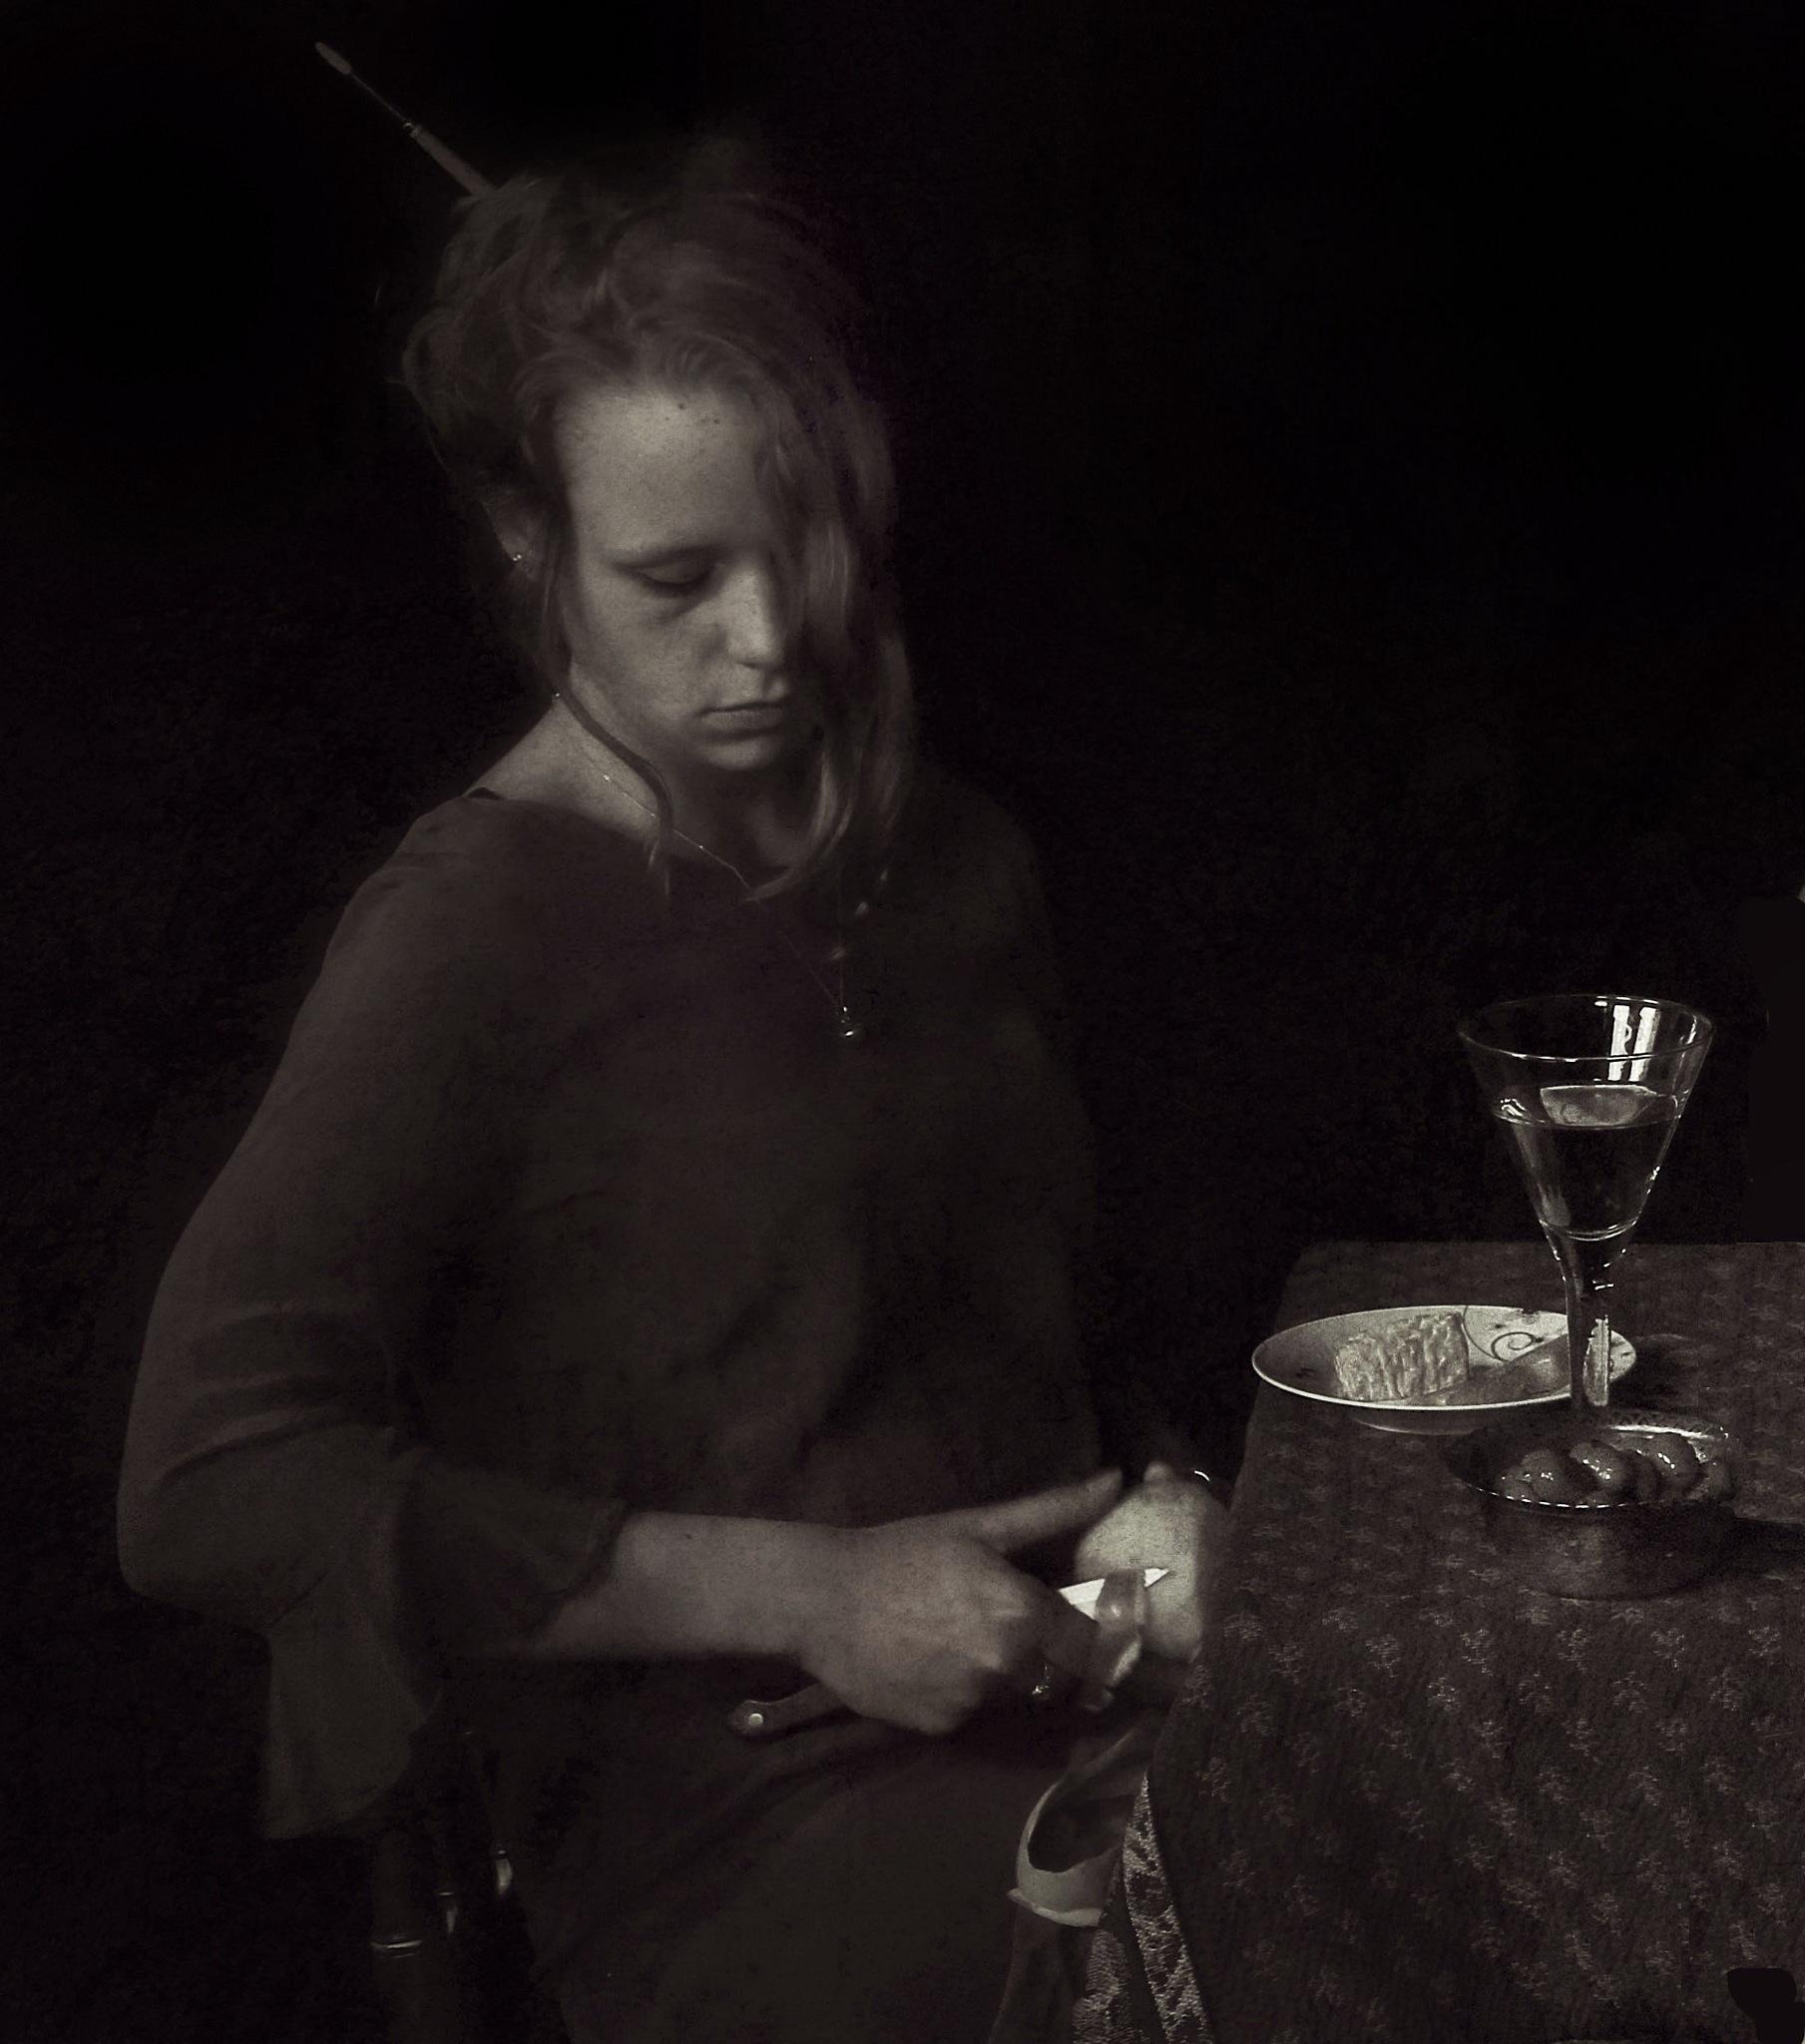 Jeune fille à table by IgorBglik